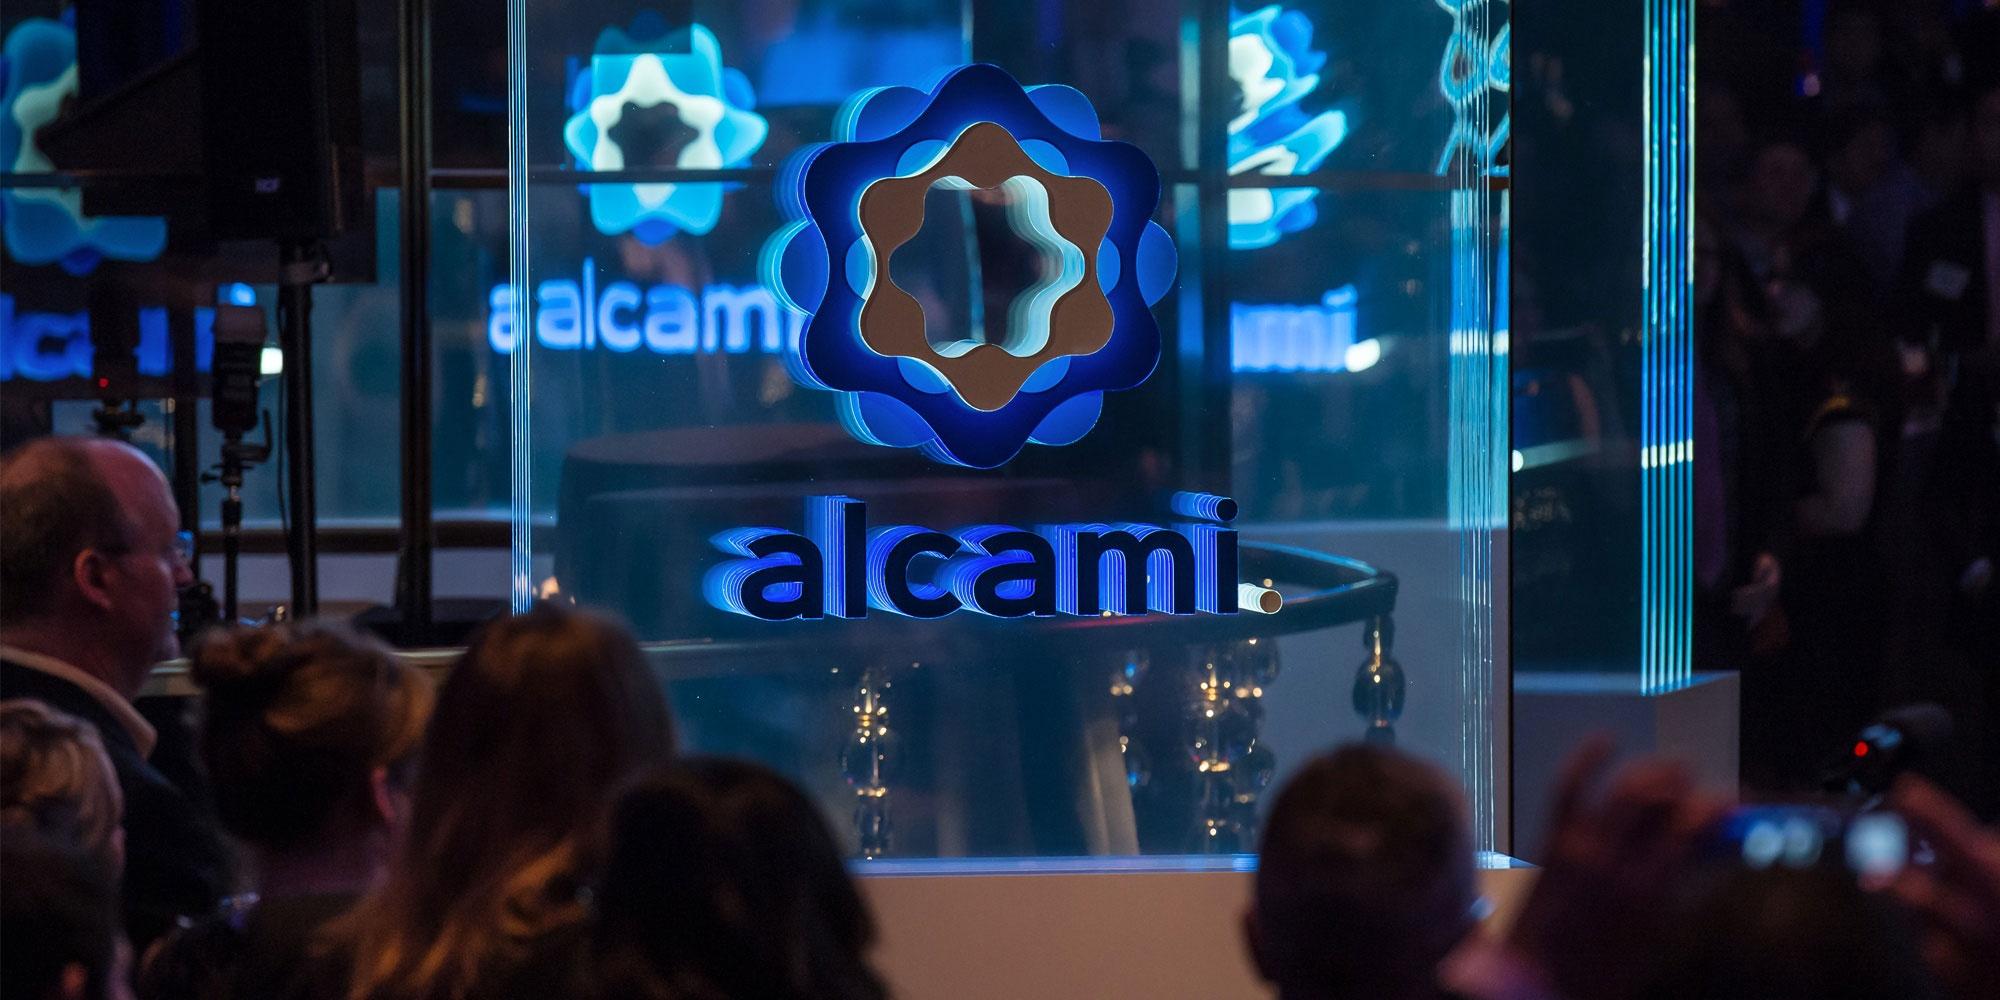 Alcami_Top_1_1.jpg